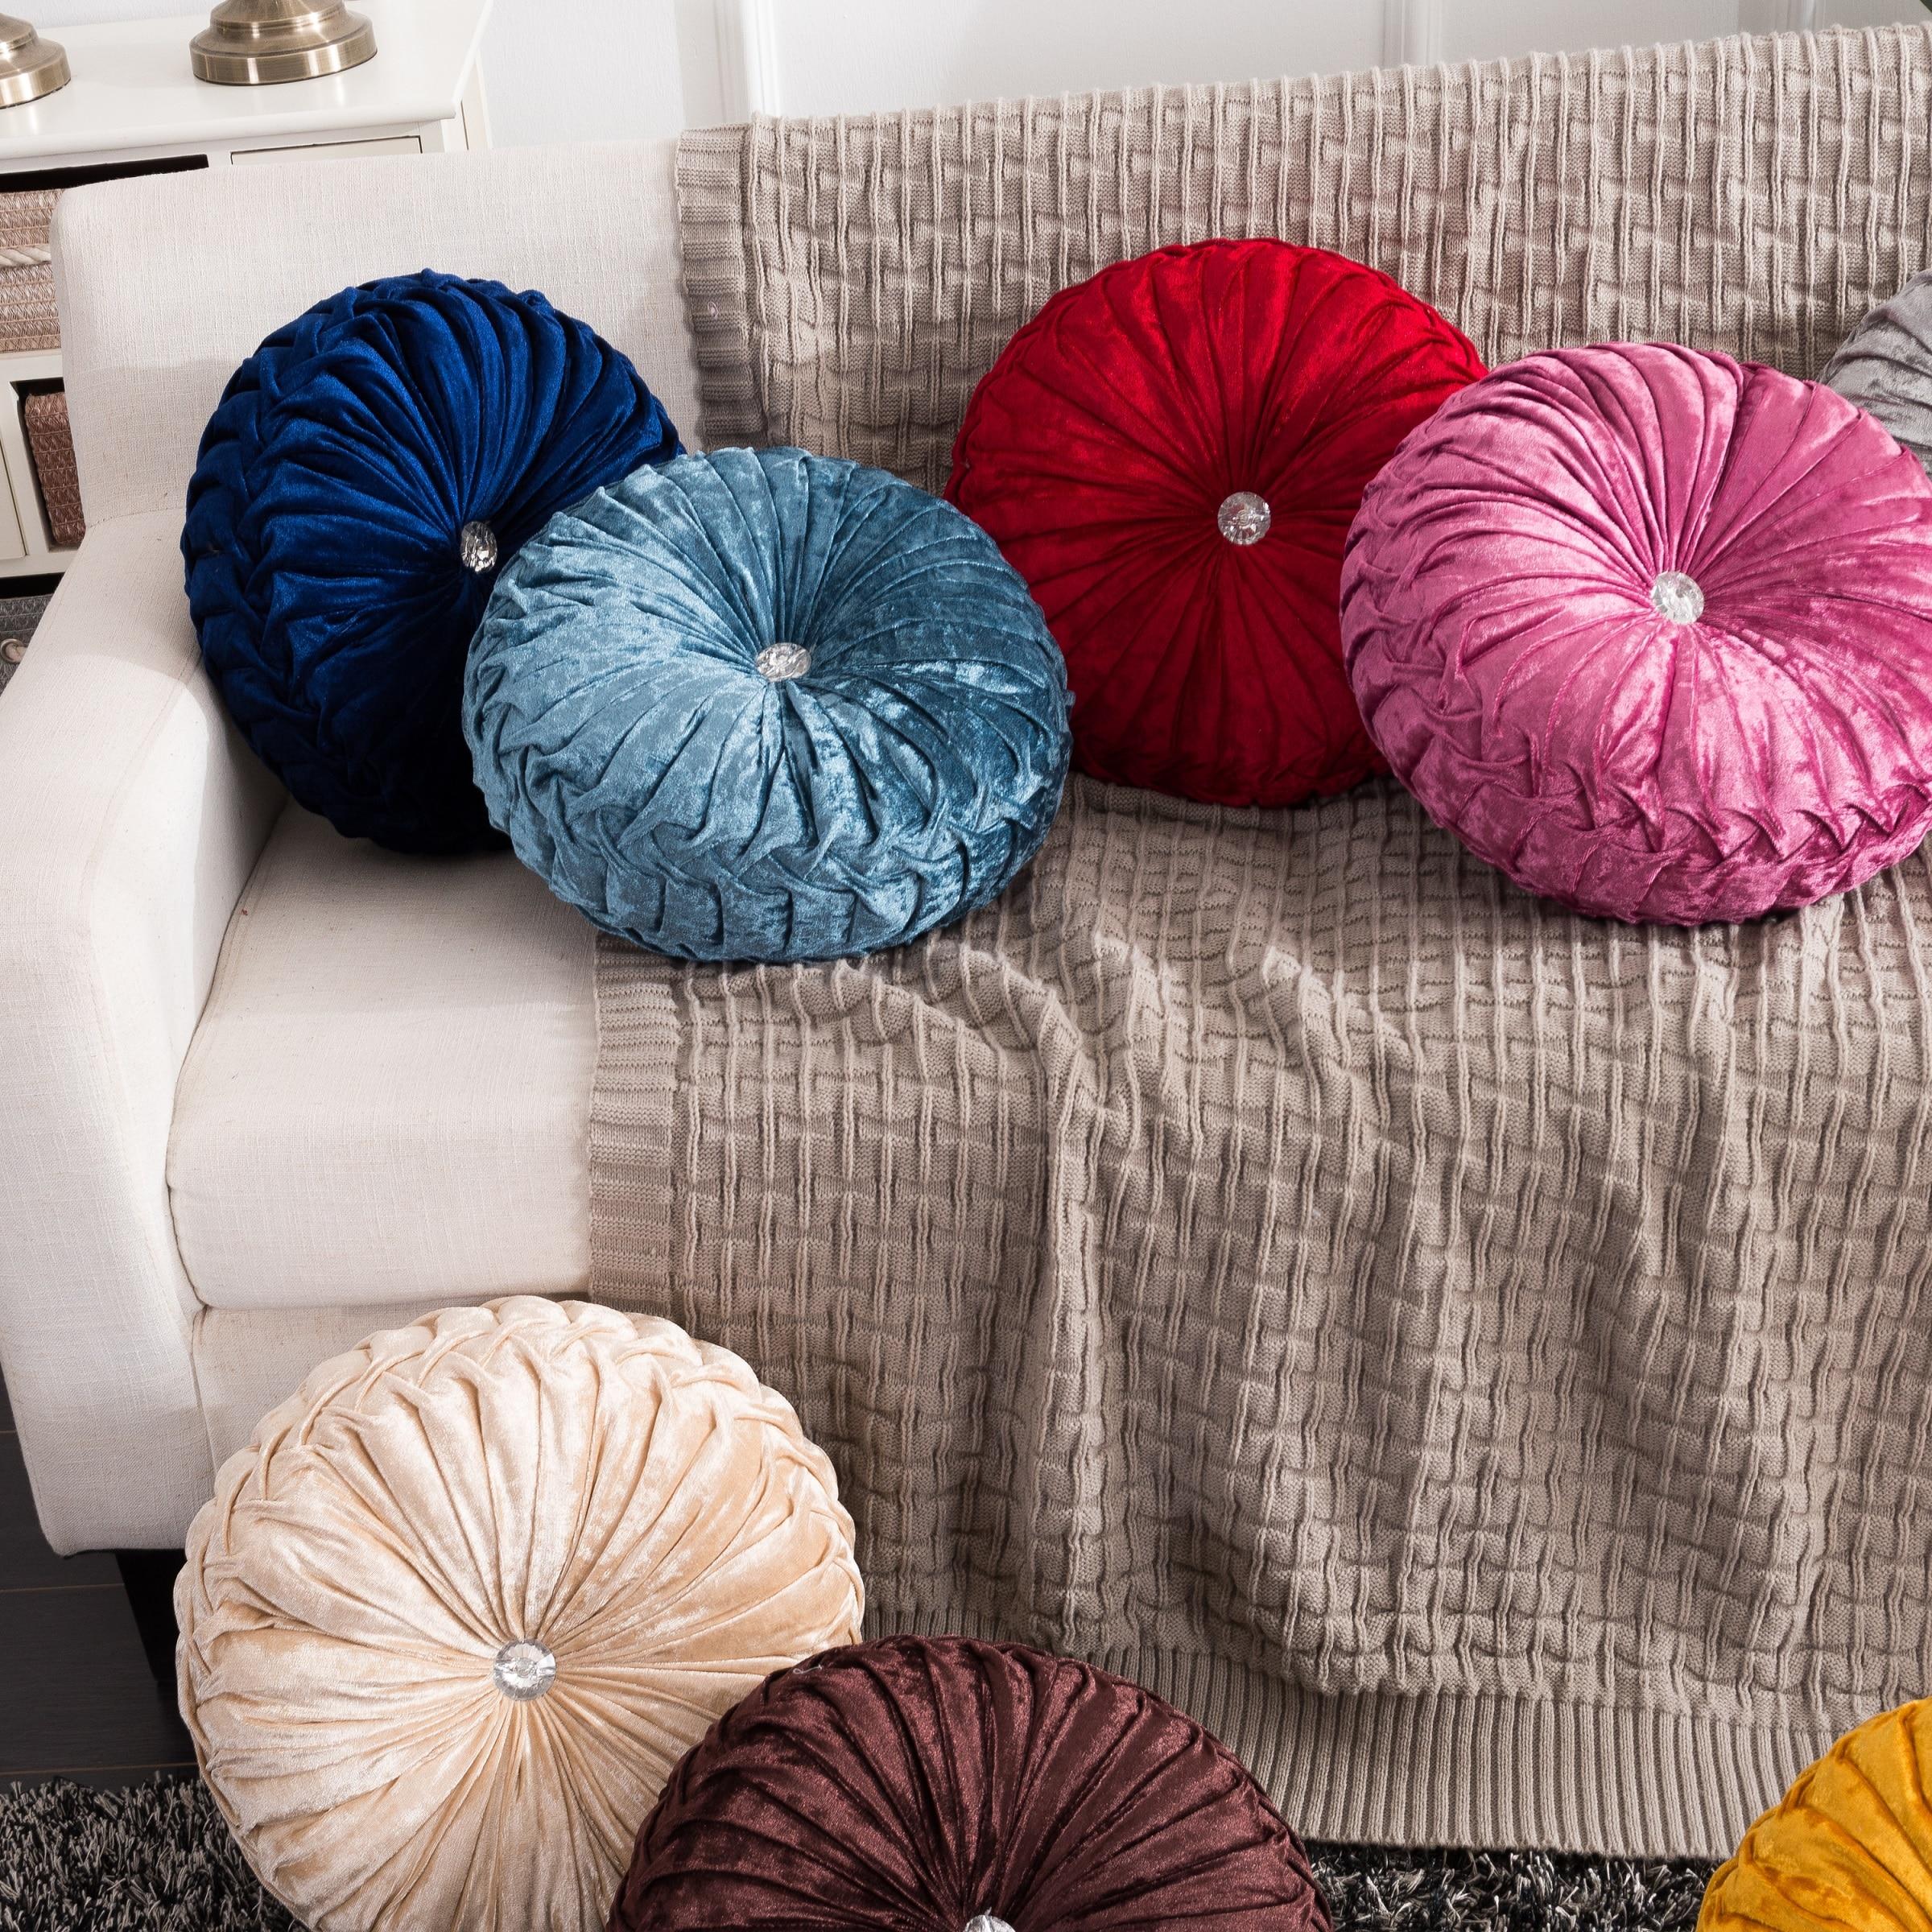 European Pastoral Style Pumpkin Round Seat Cushion Back Cushion or as Sofa pillow Velvet Fabric European Pastoral Style Pumpkin Round Seat Cushion/Back Cushion or as Sofa pillow Velvet Fabric 35x35cm 9 Colors